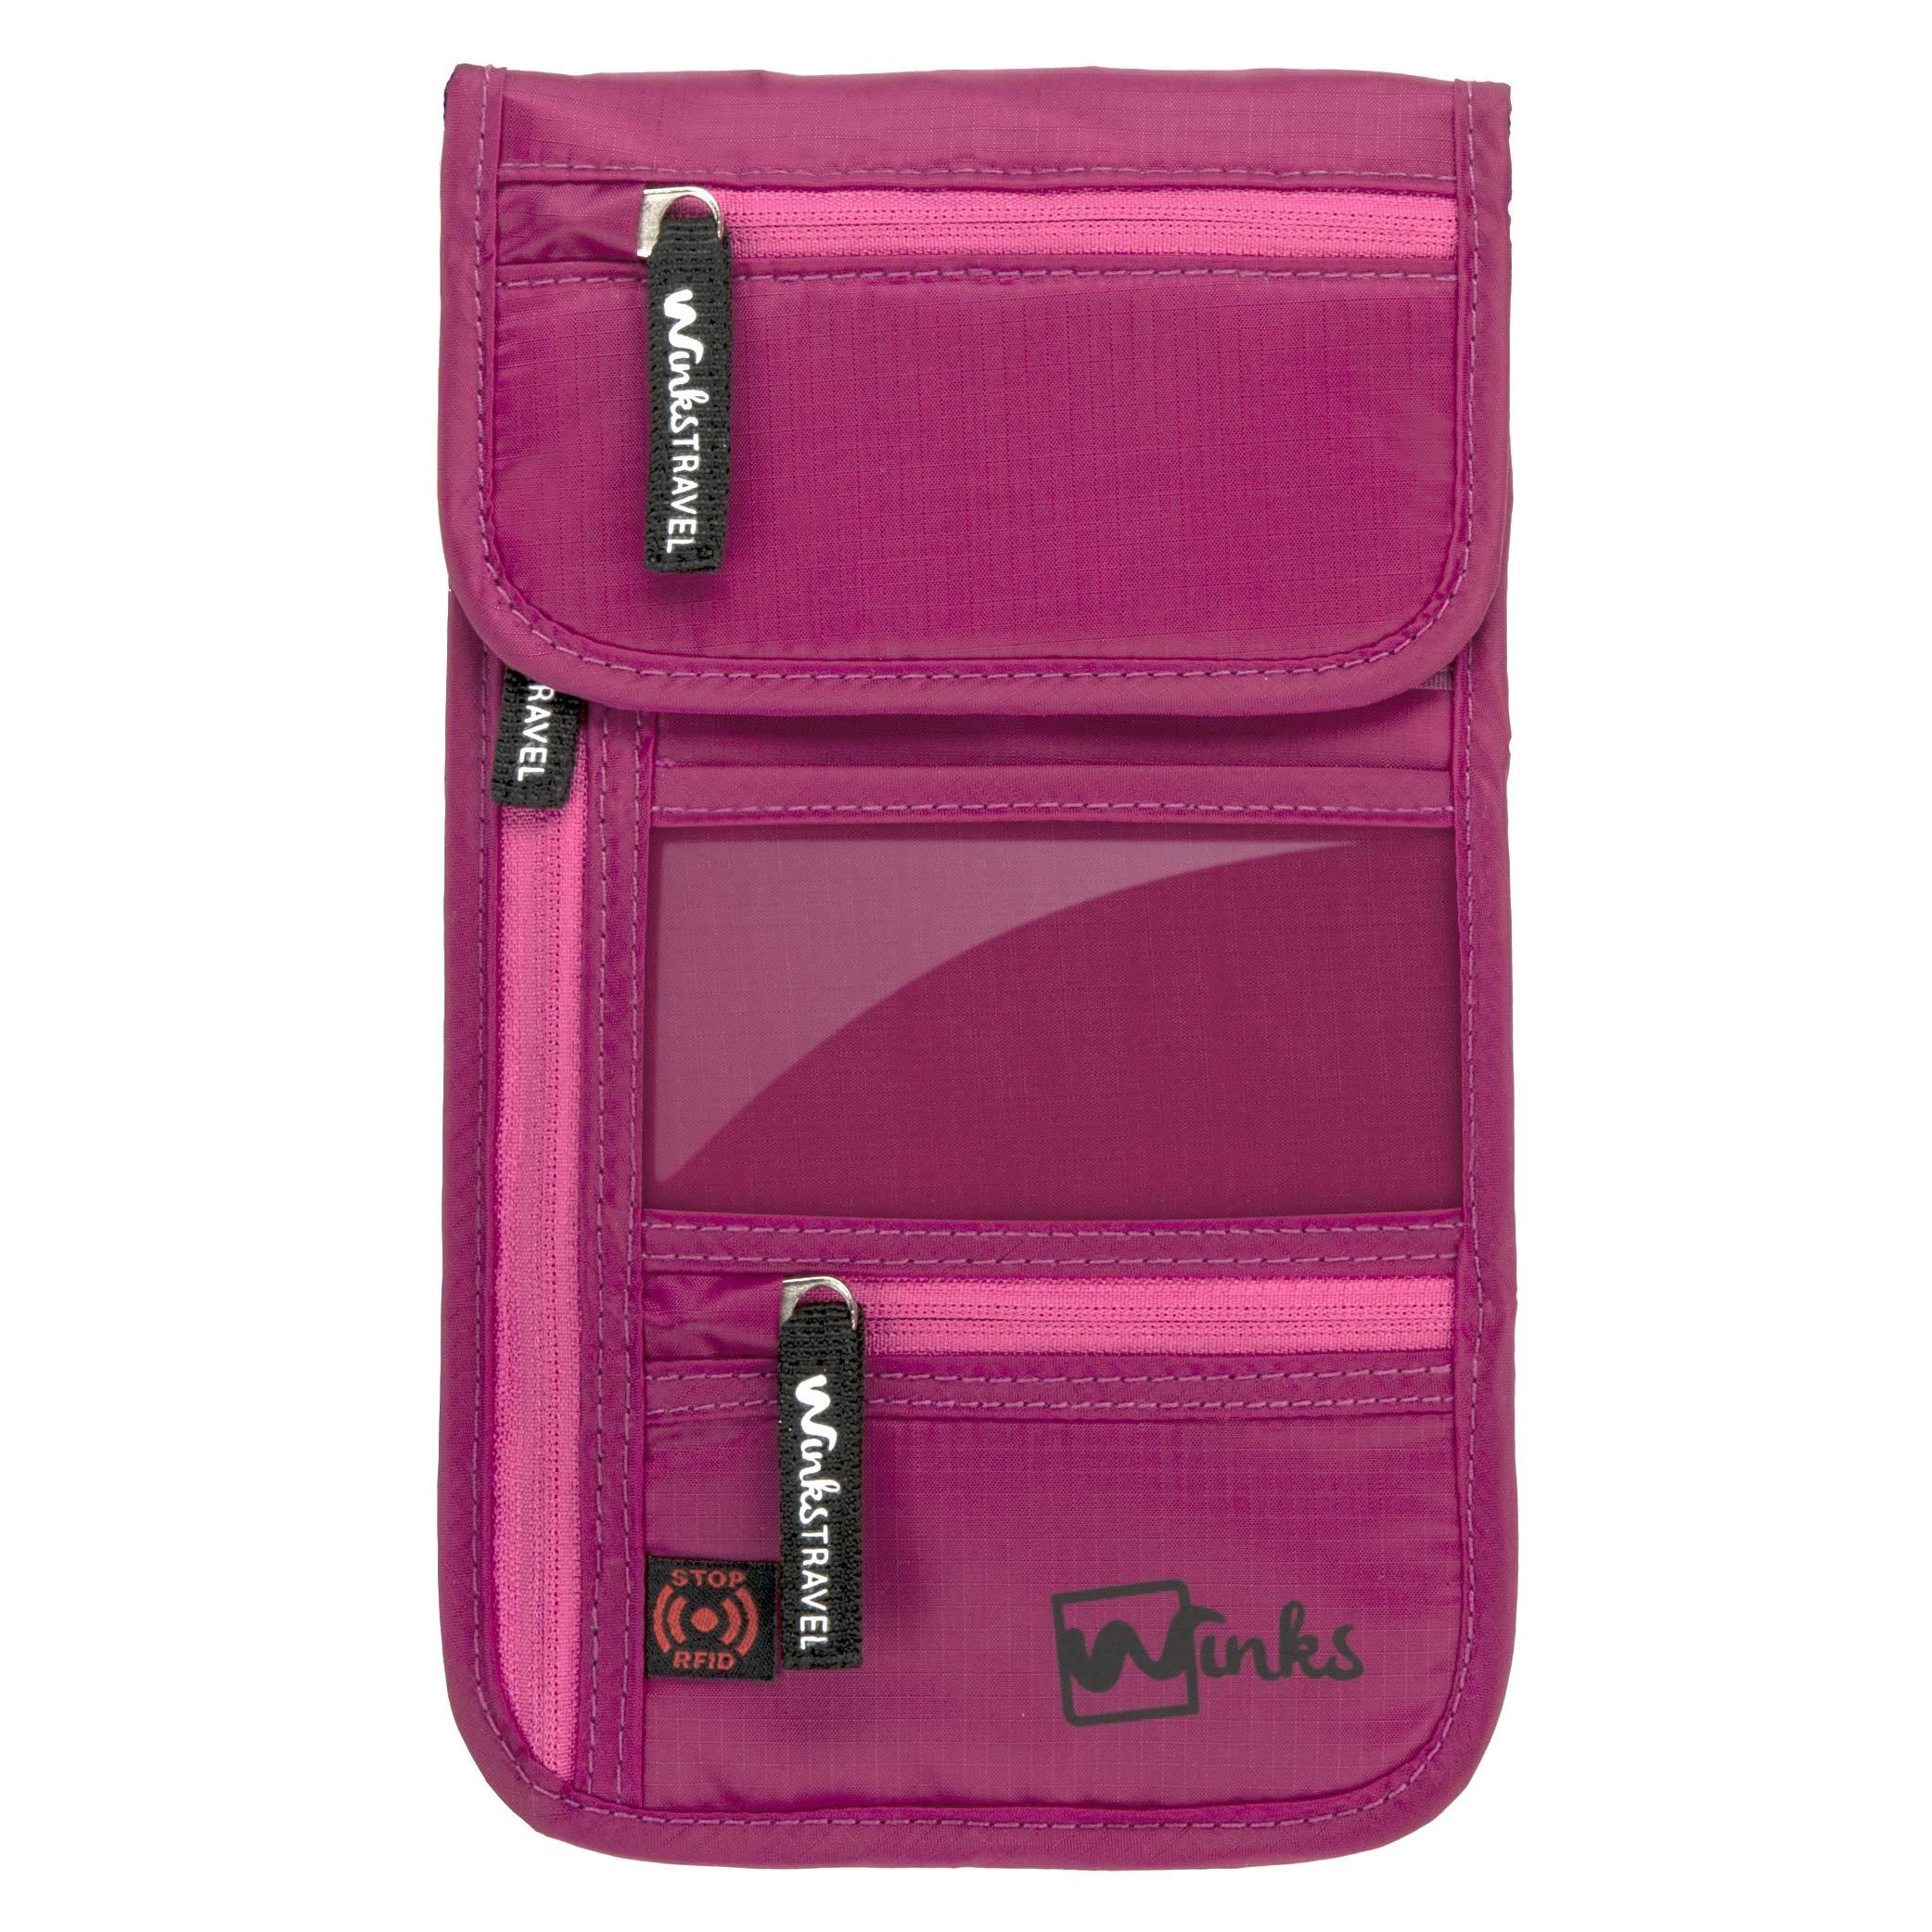 Winks Travel Shoulder Wallet Holder for Women | RFID Blocking Neck Pouch by Winks Travel